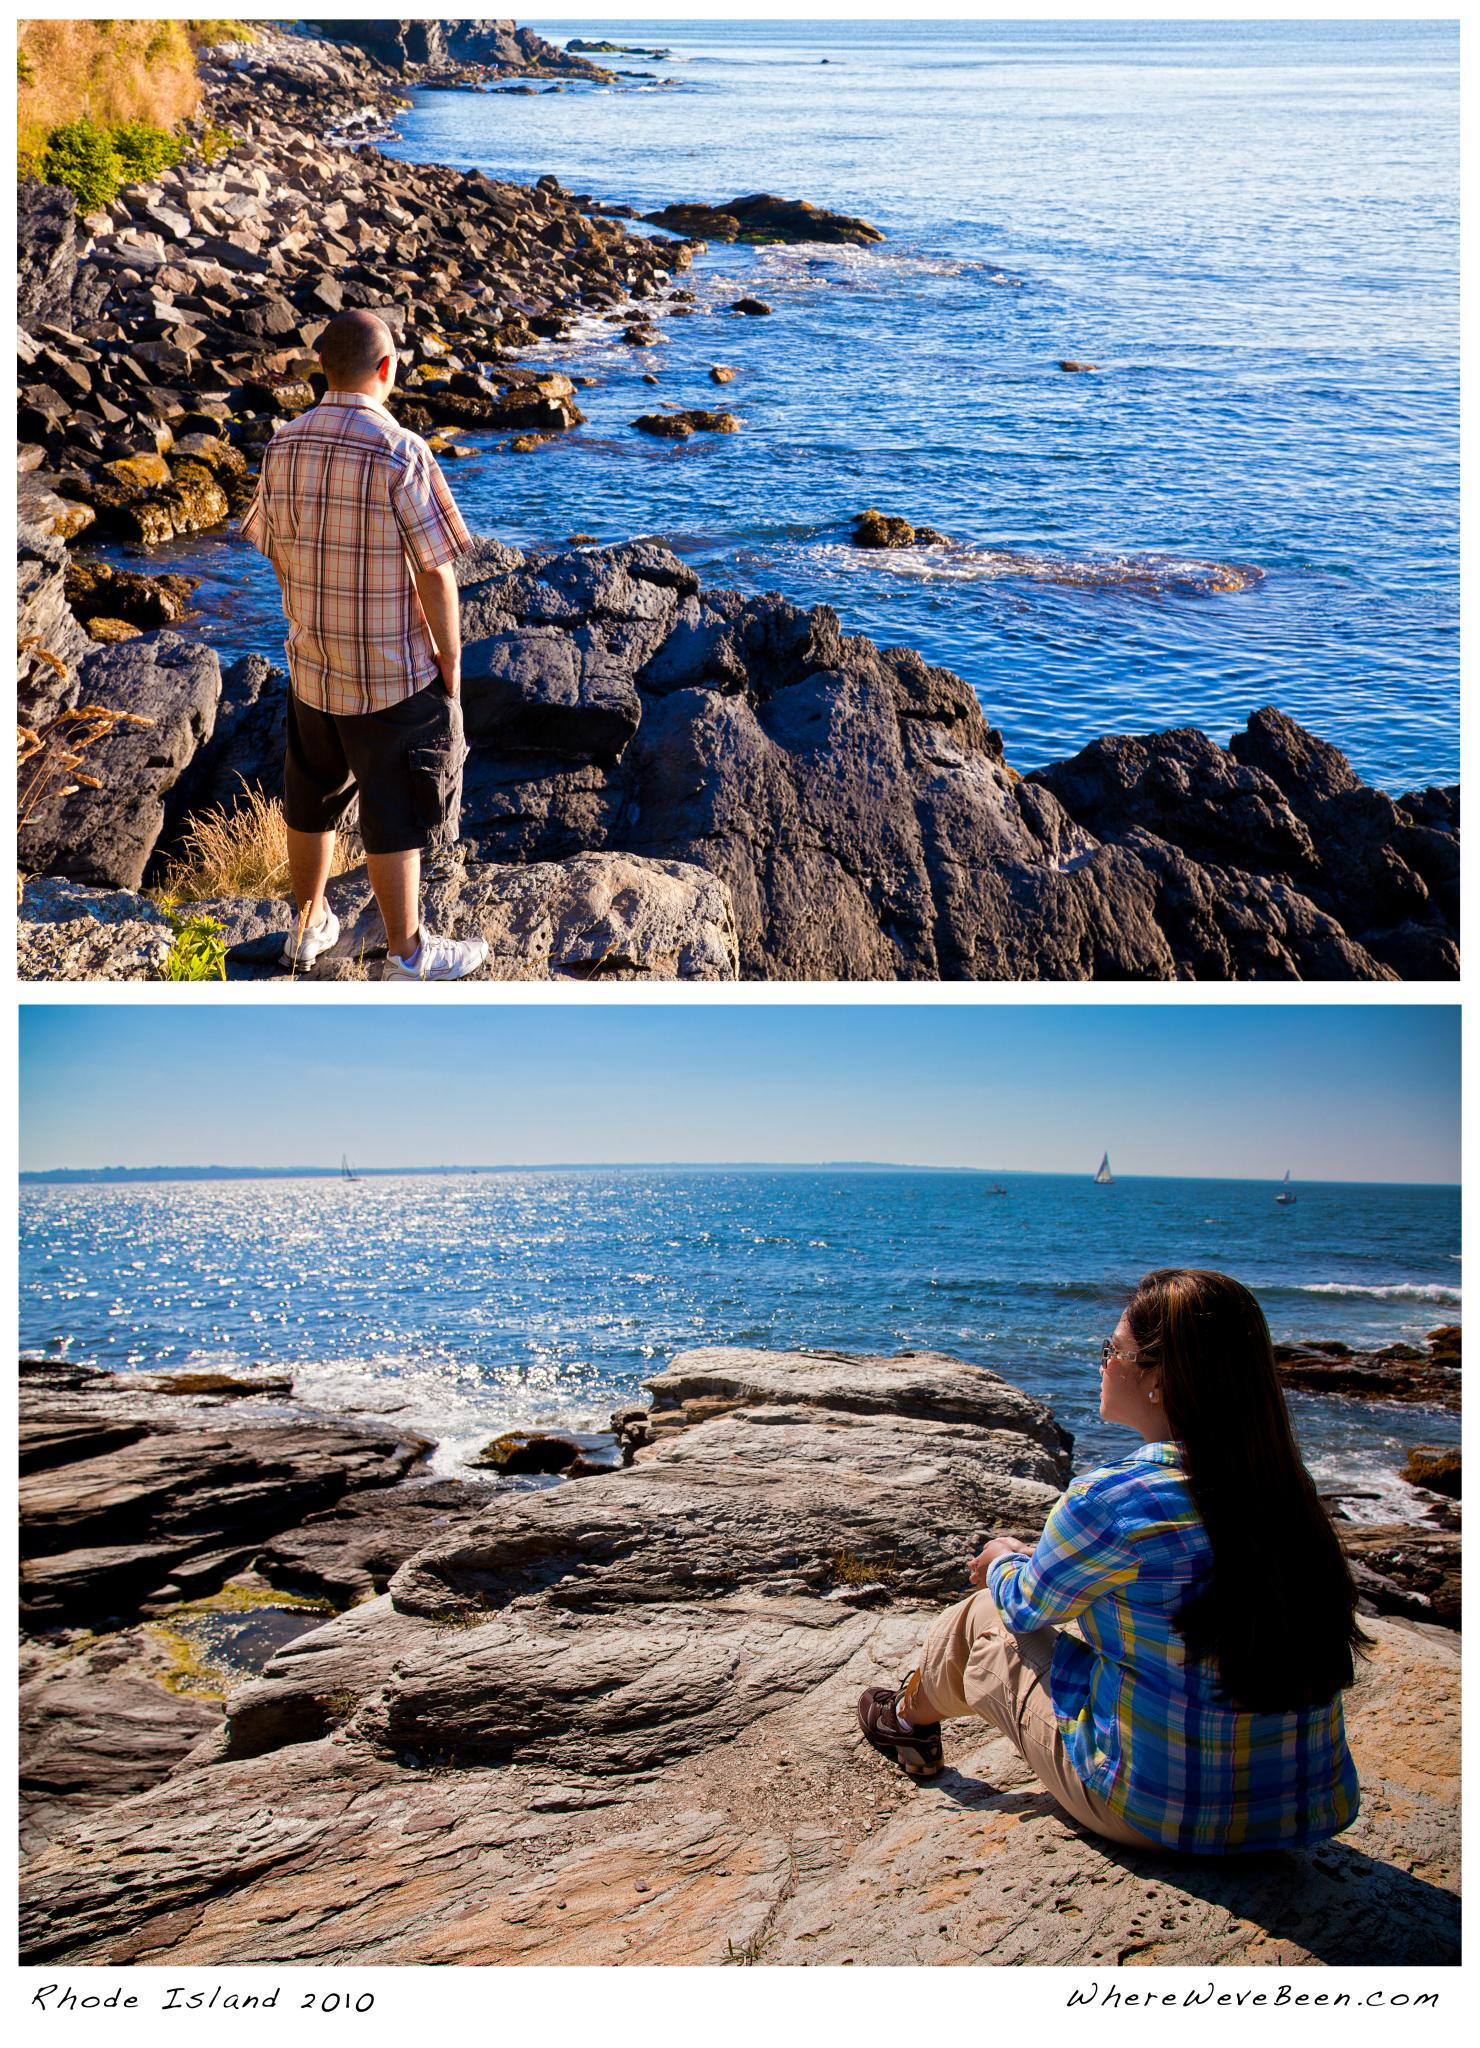 Rhode Island 2010